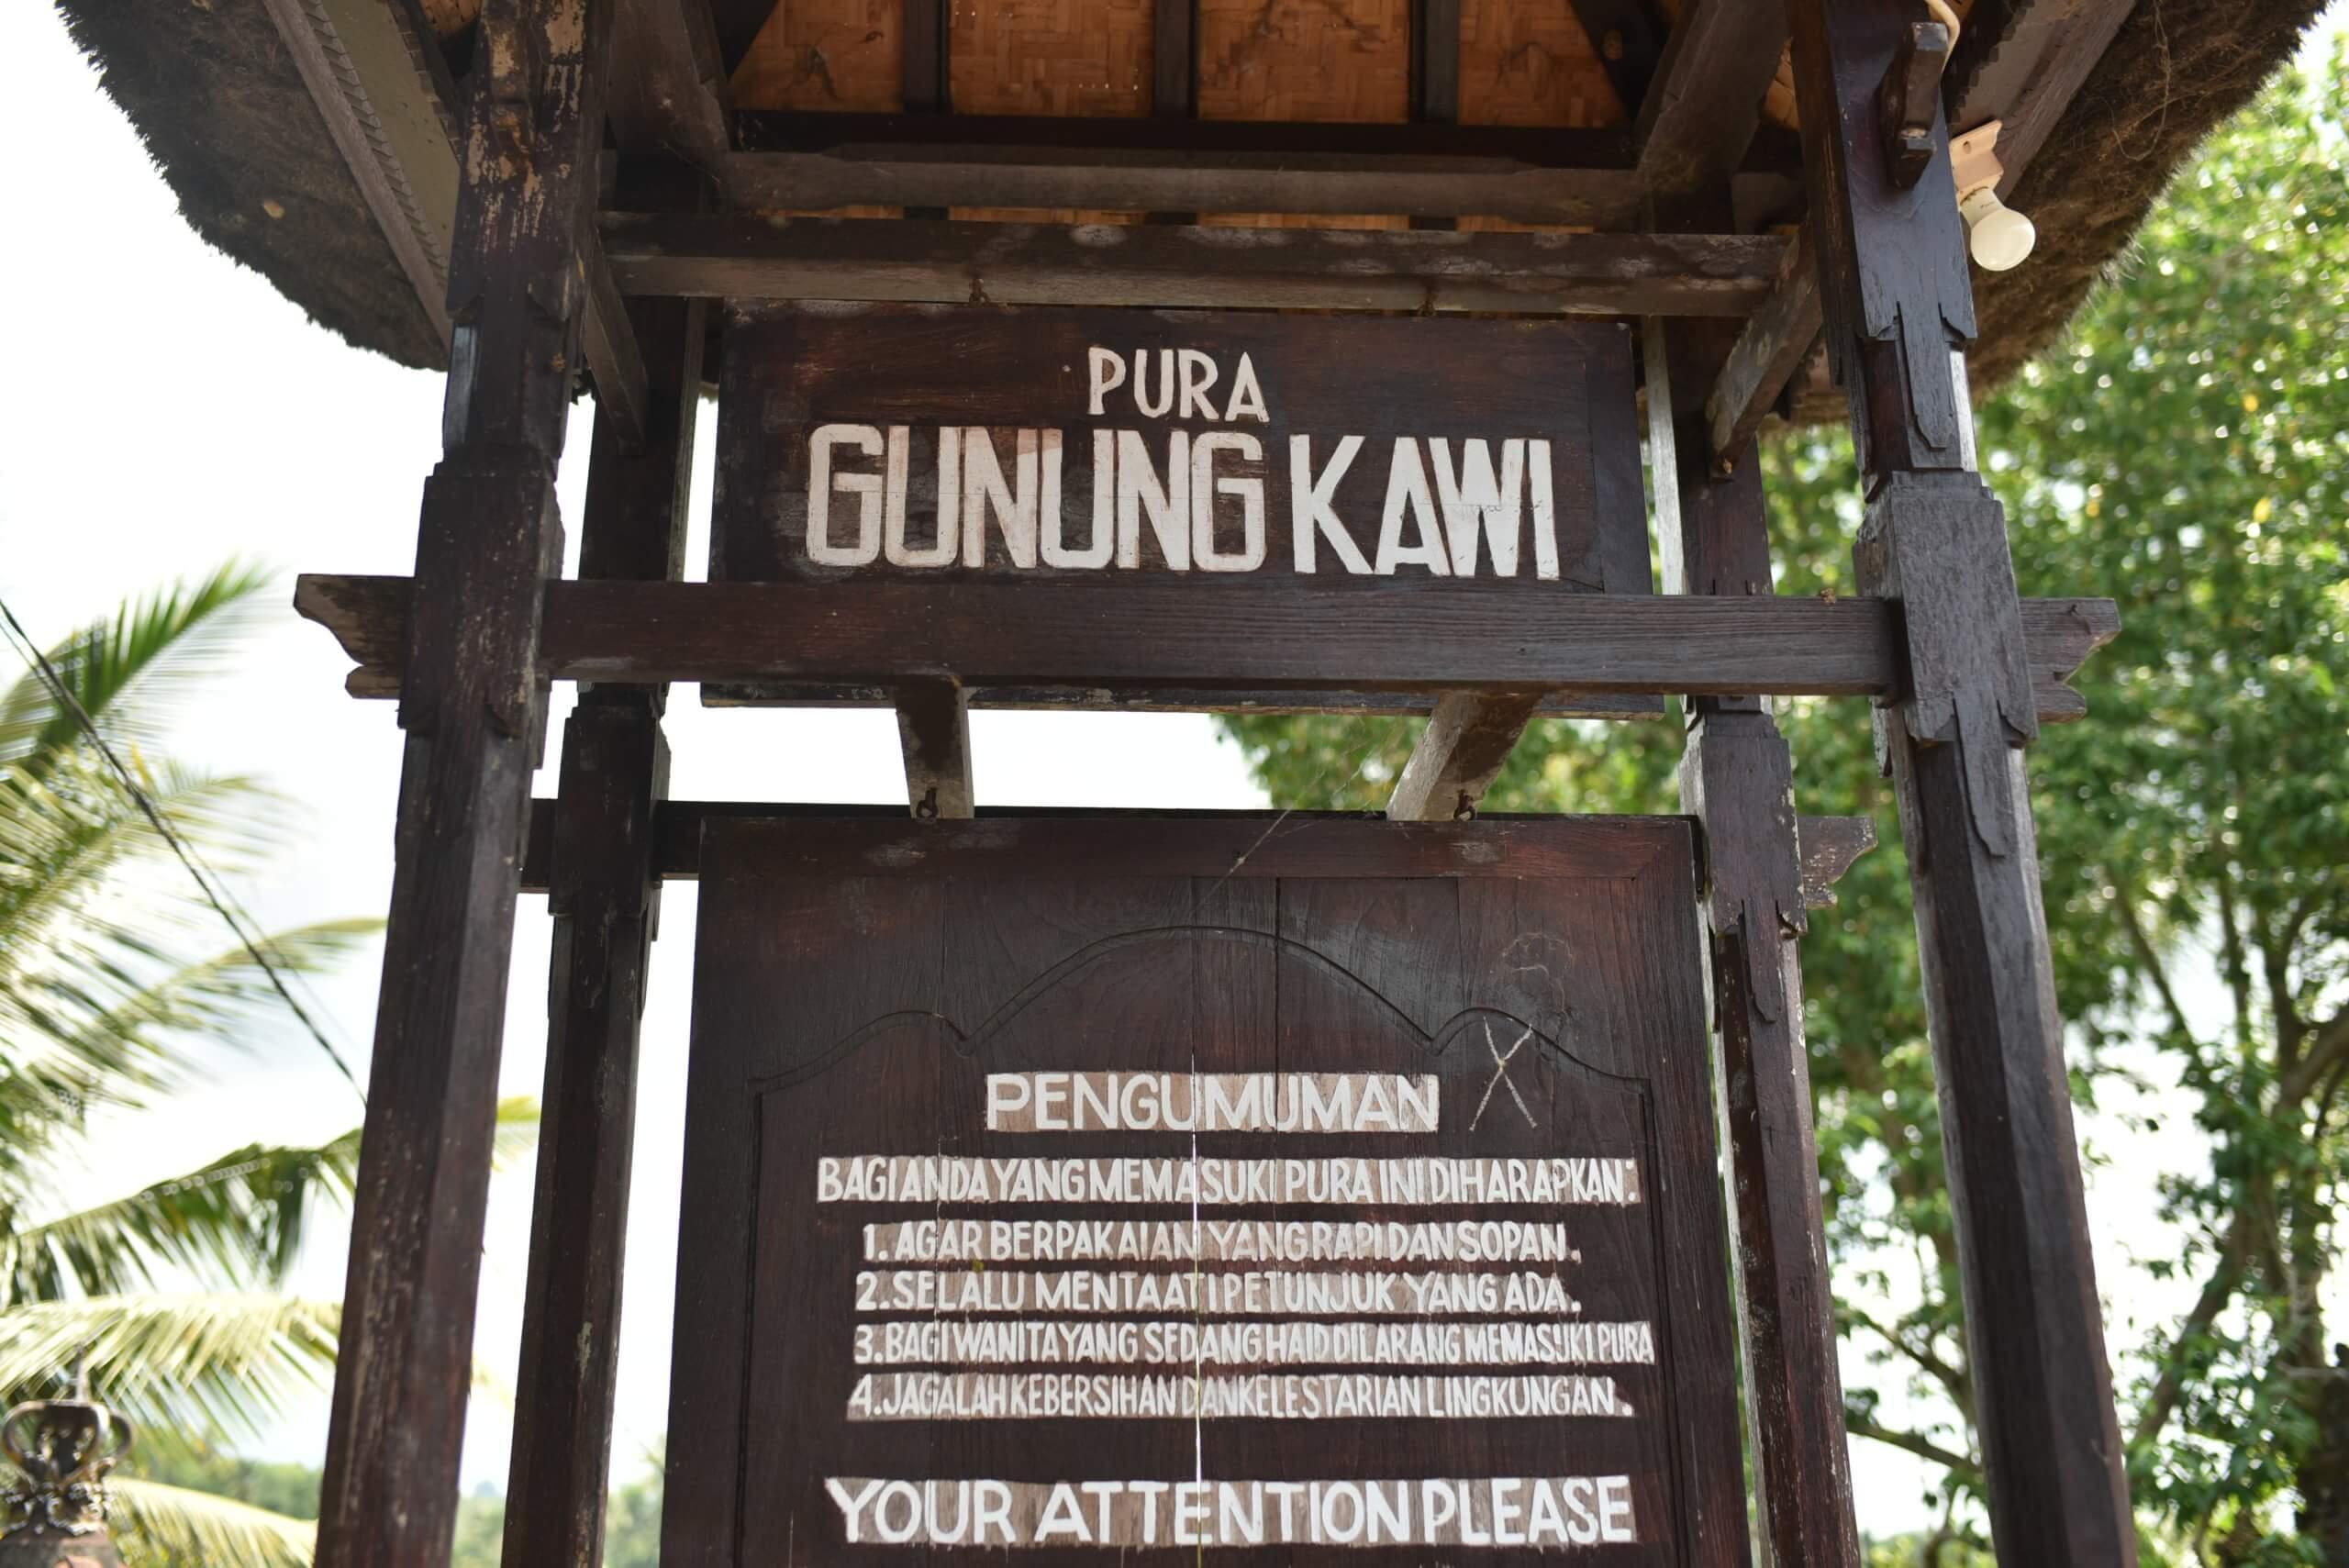 Descriptif a l'entrée du temple gunung kawi